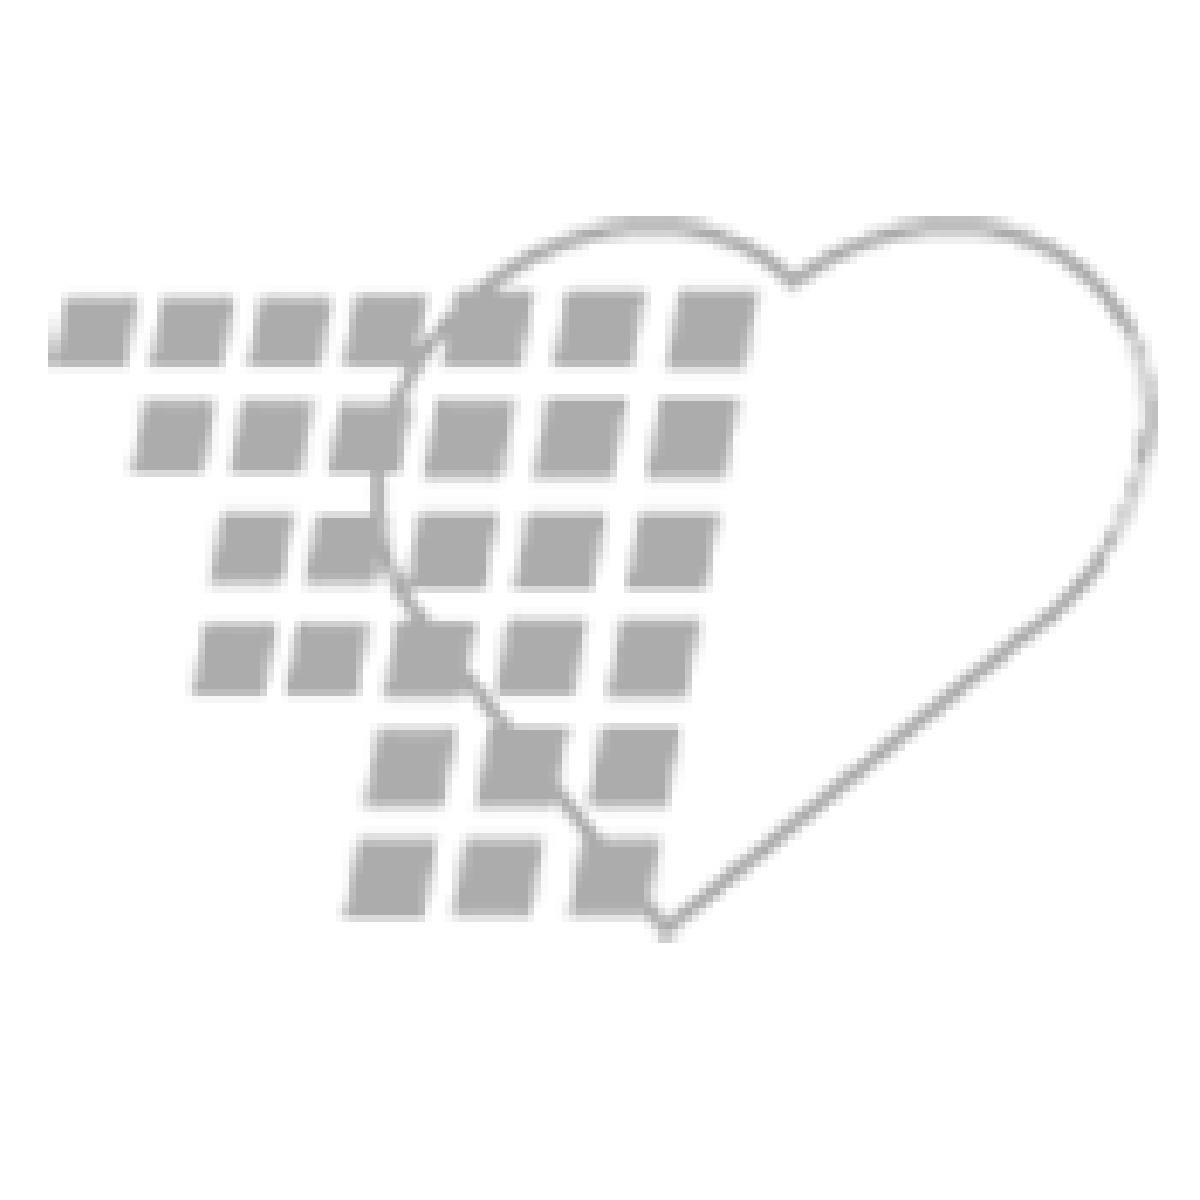 11-81-2015 Laerdal SimPad Sounds Trainer